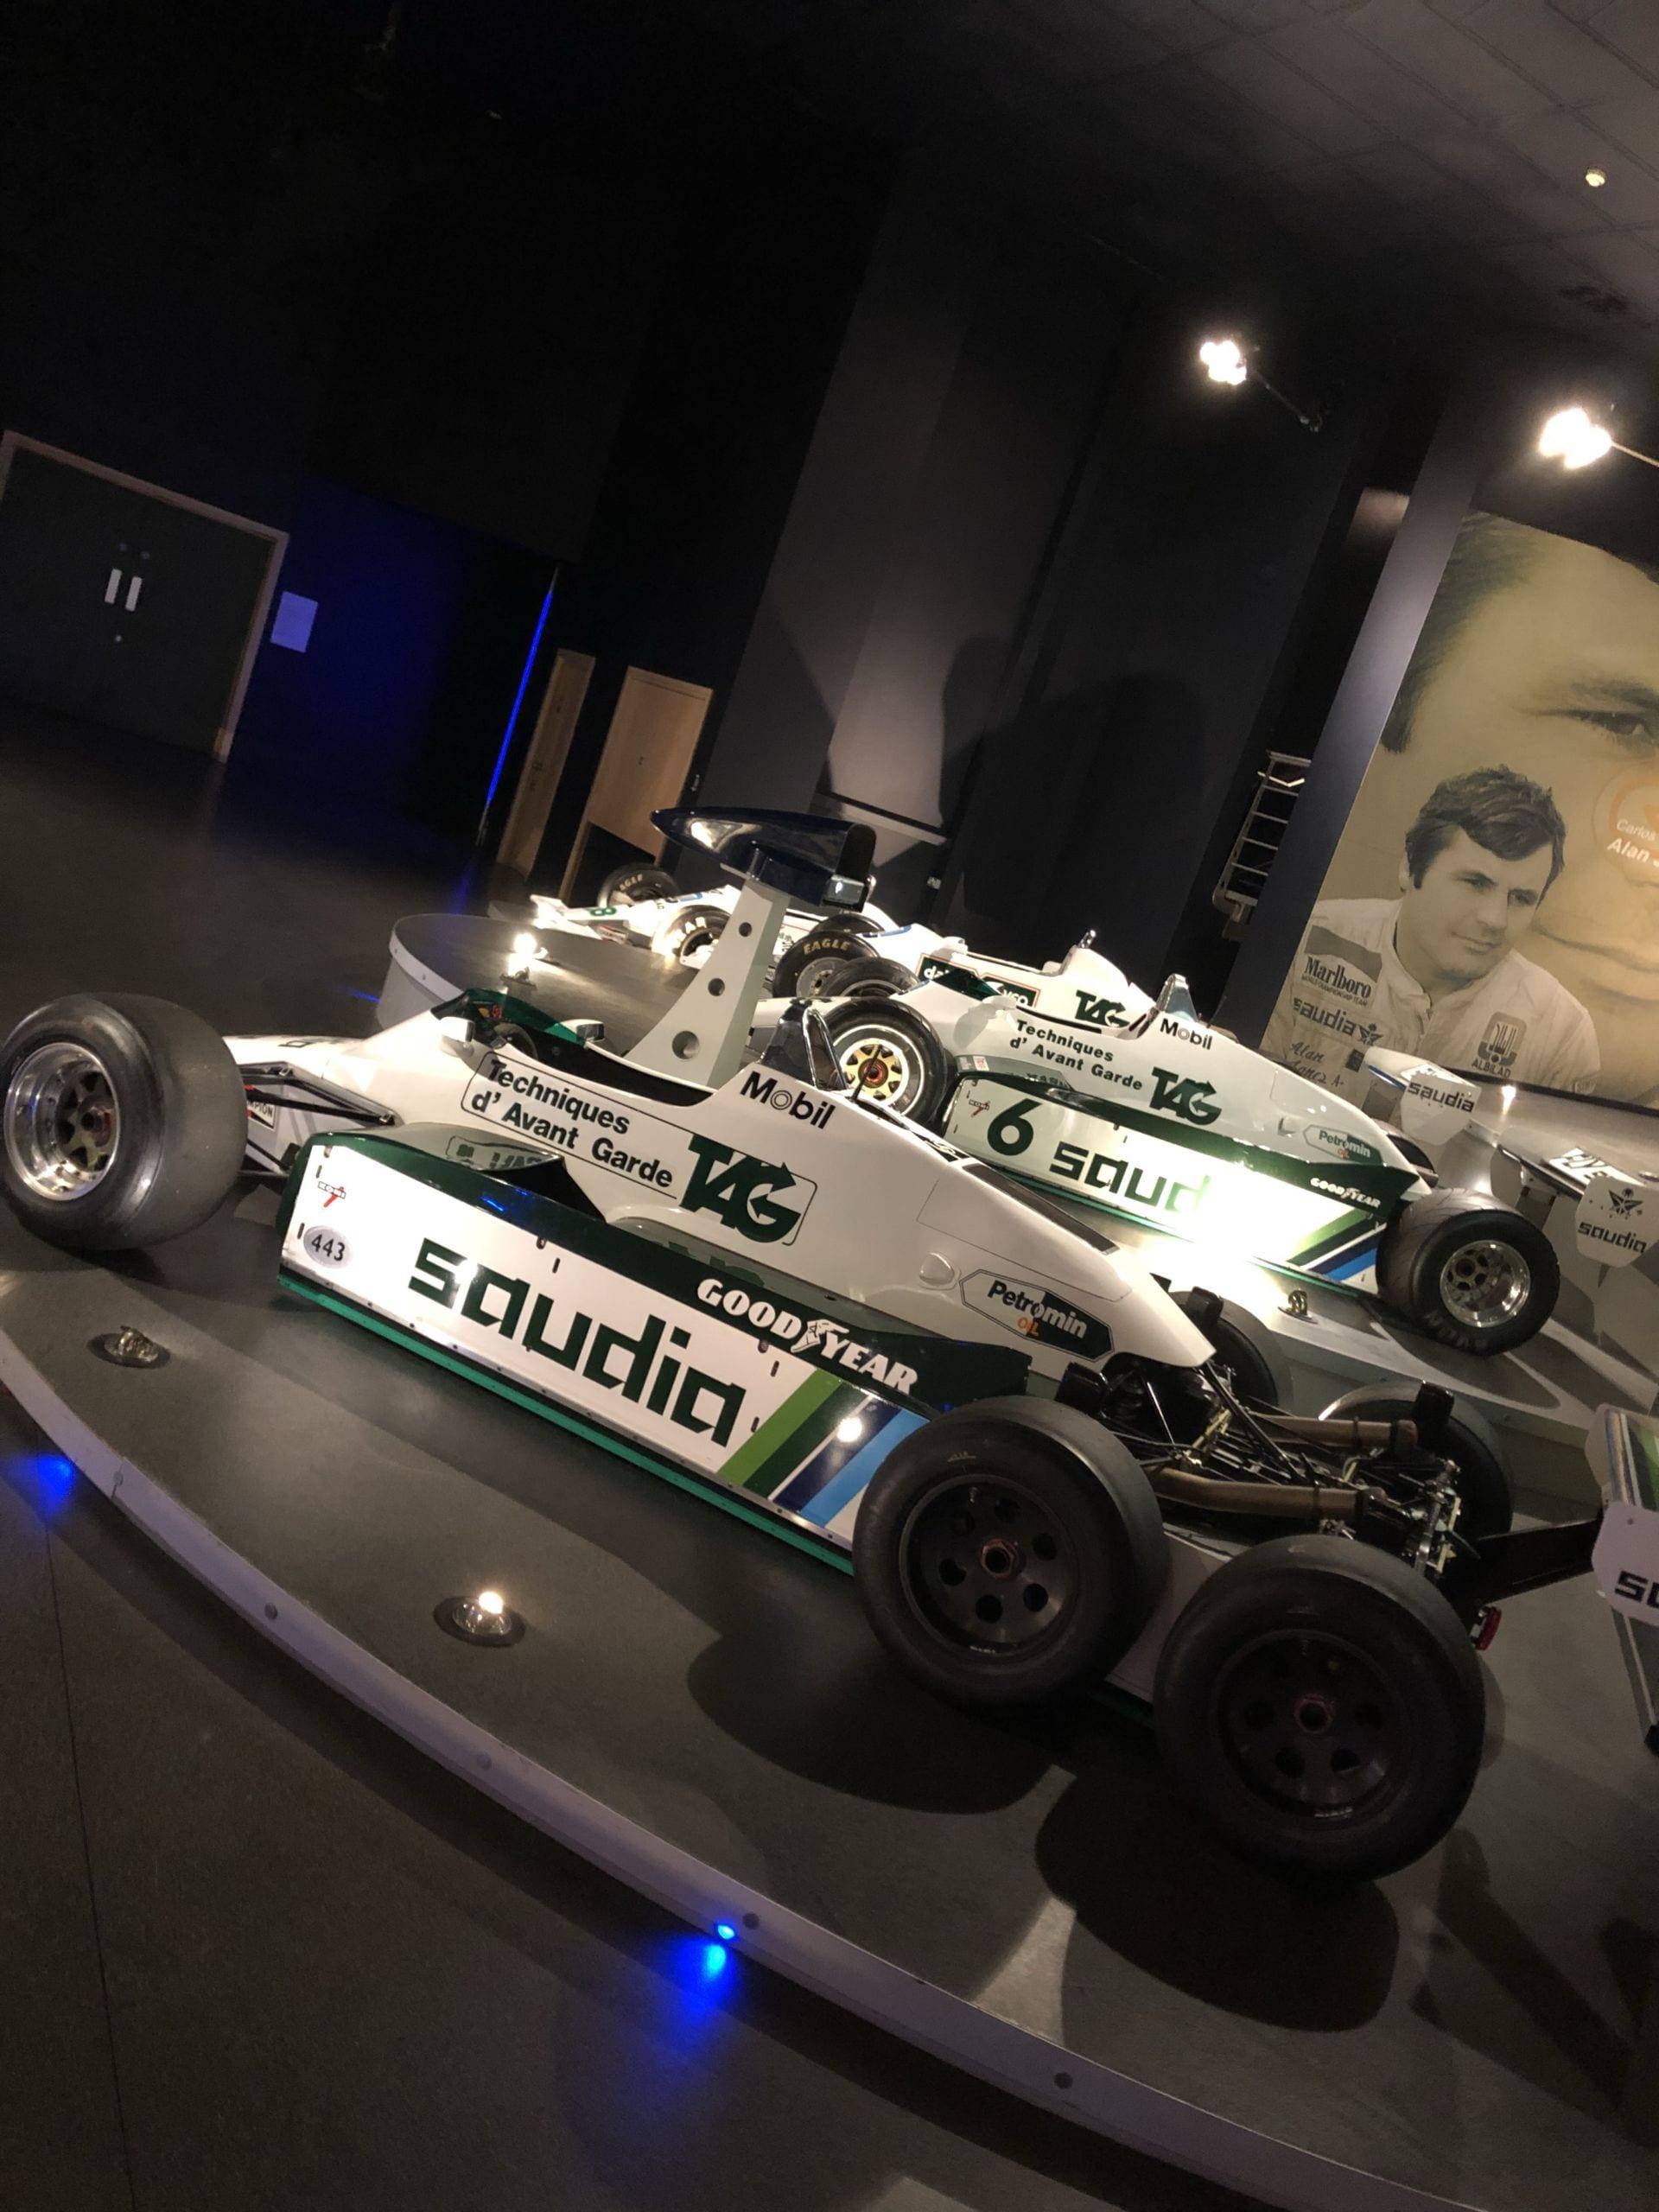 FW07 Grand Prix Car